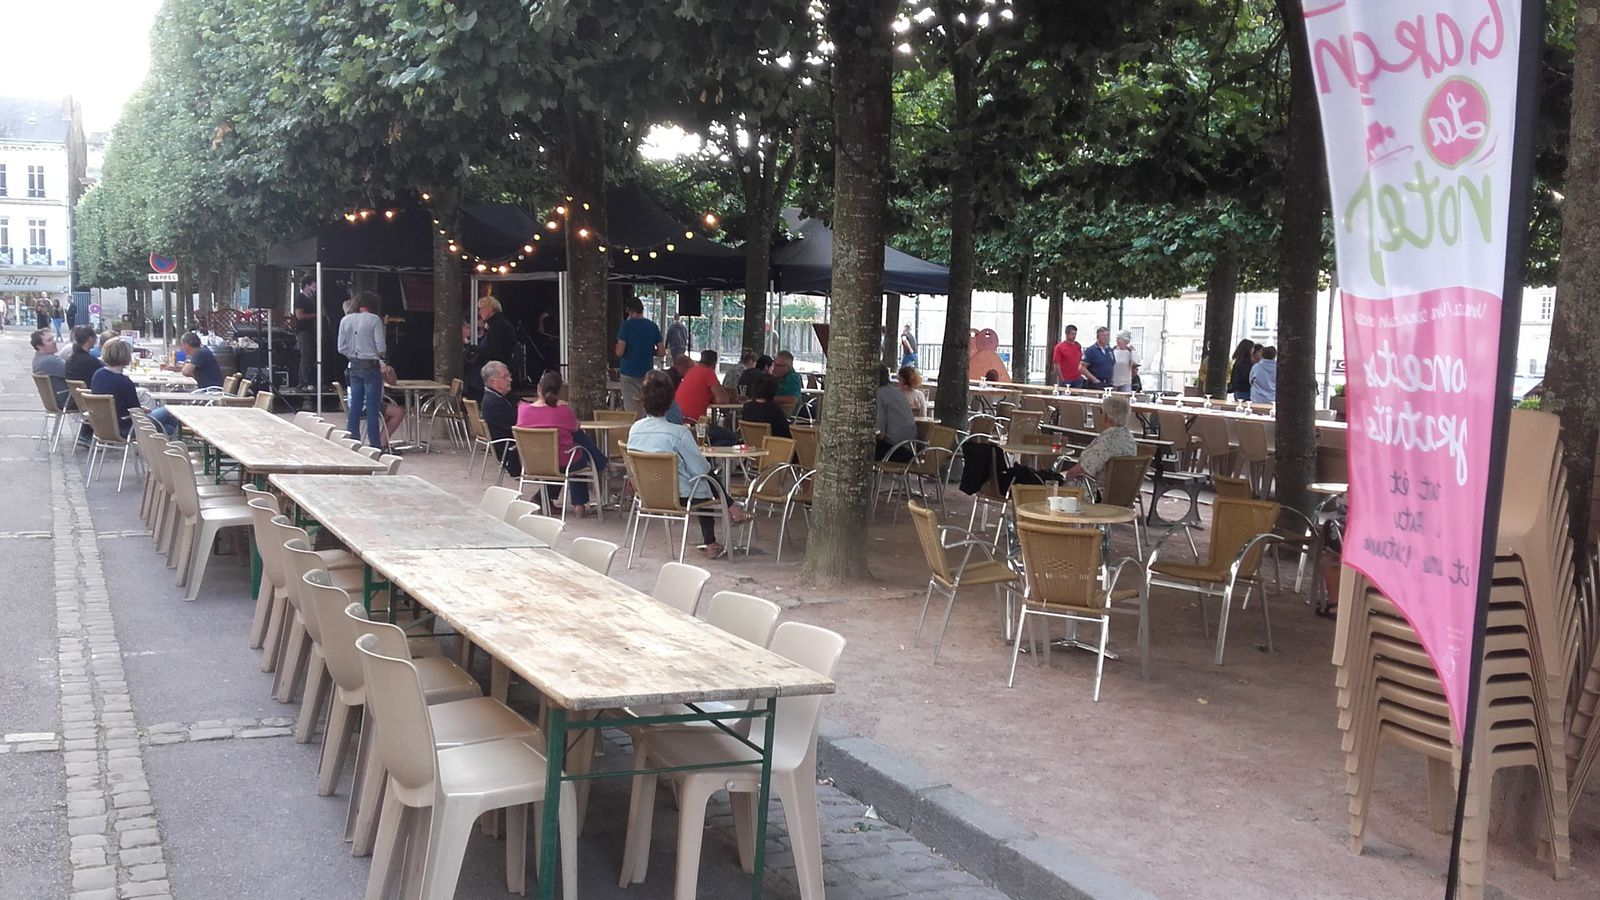 9 août - Jagas - Festival Garçon, la Note !